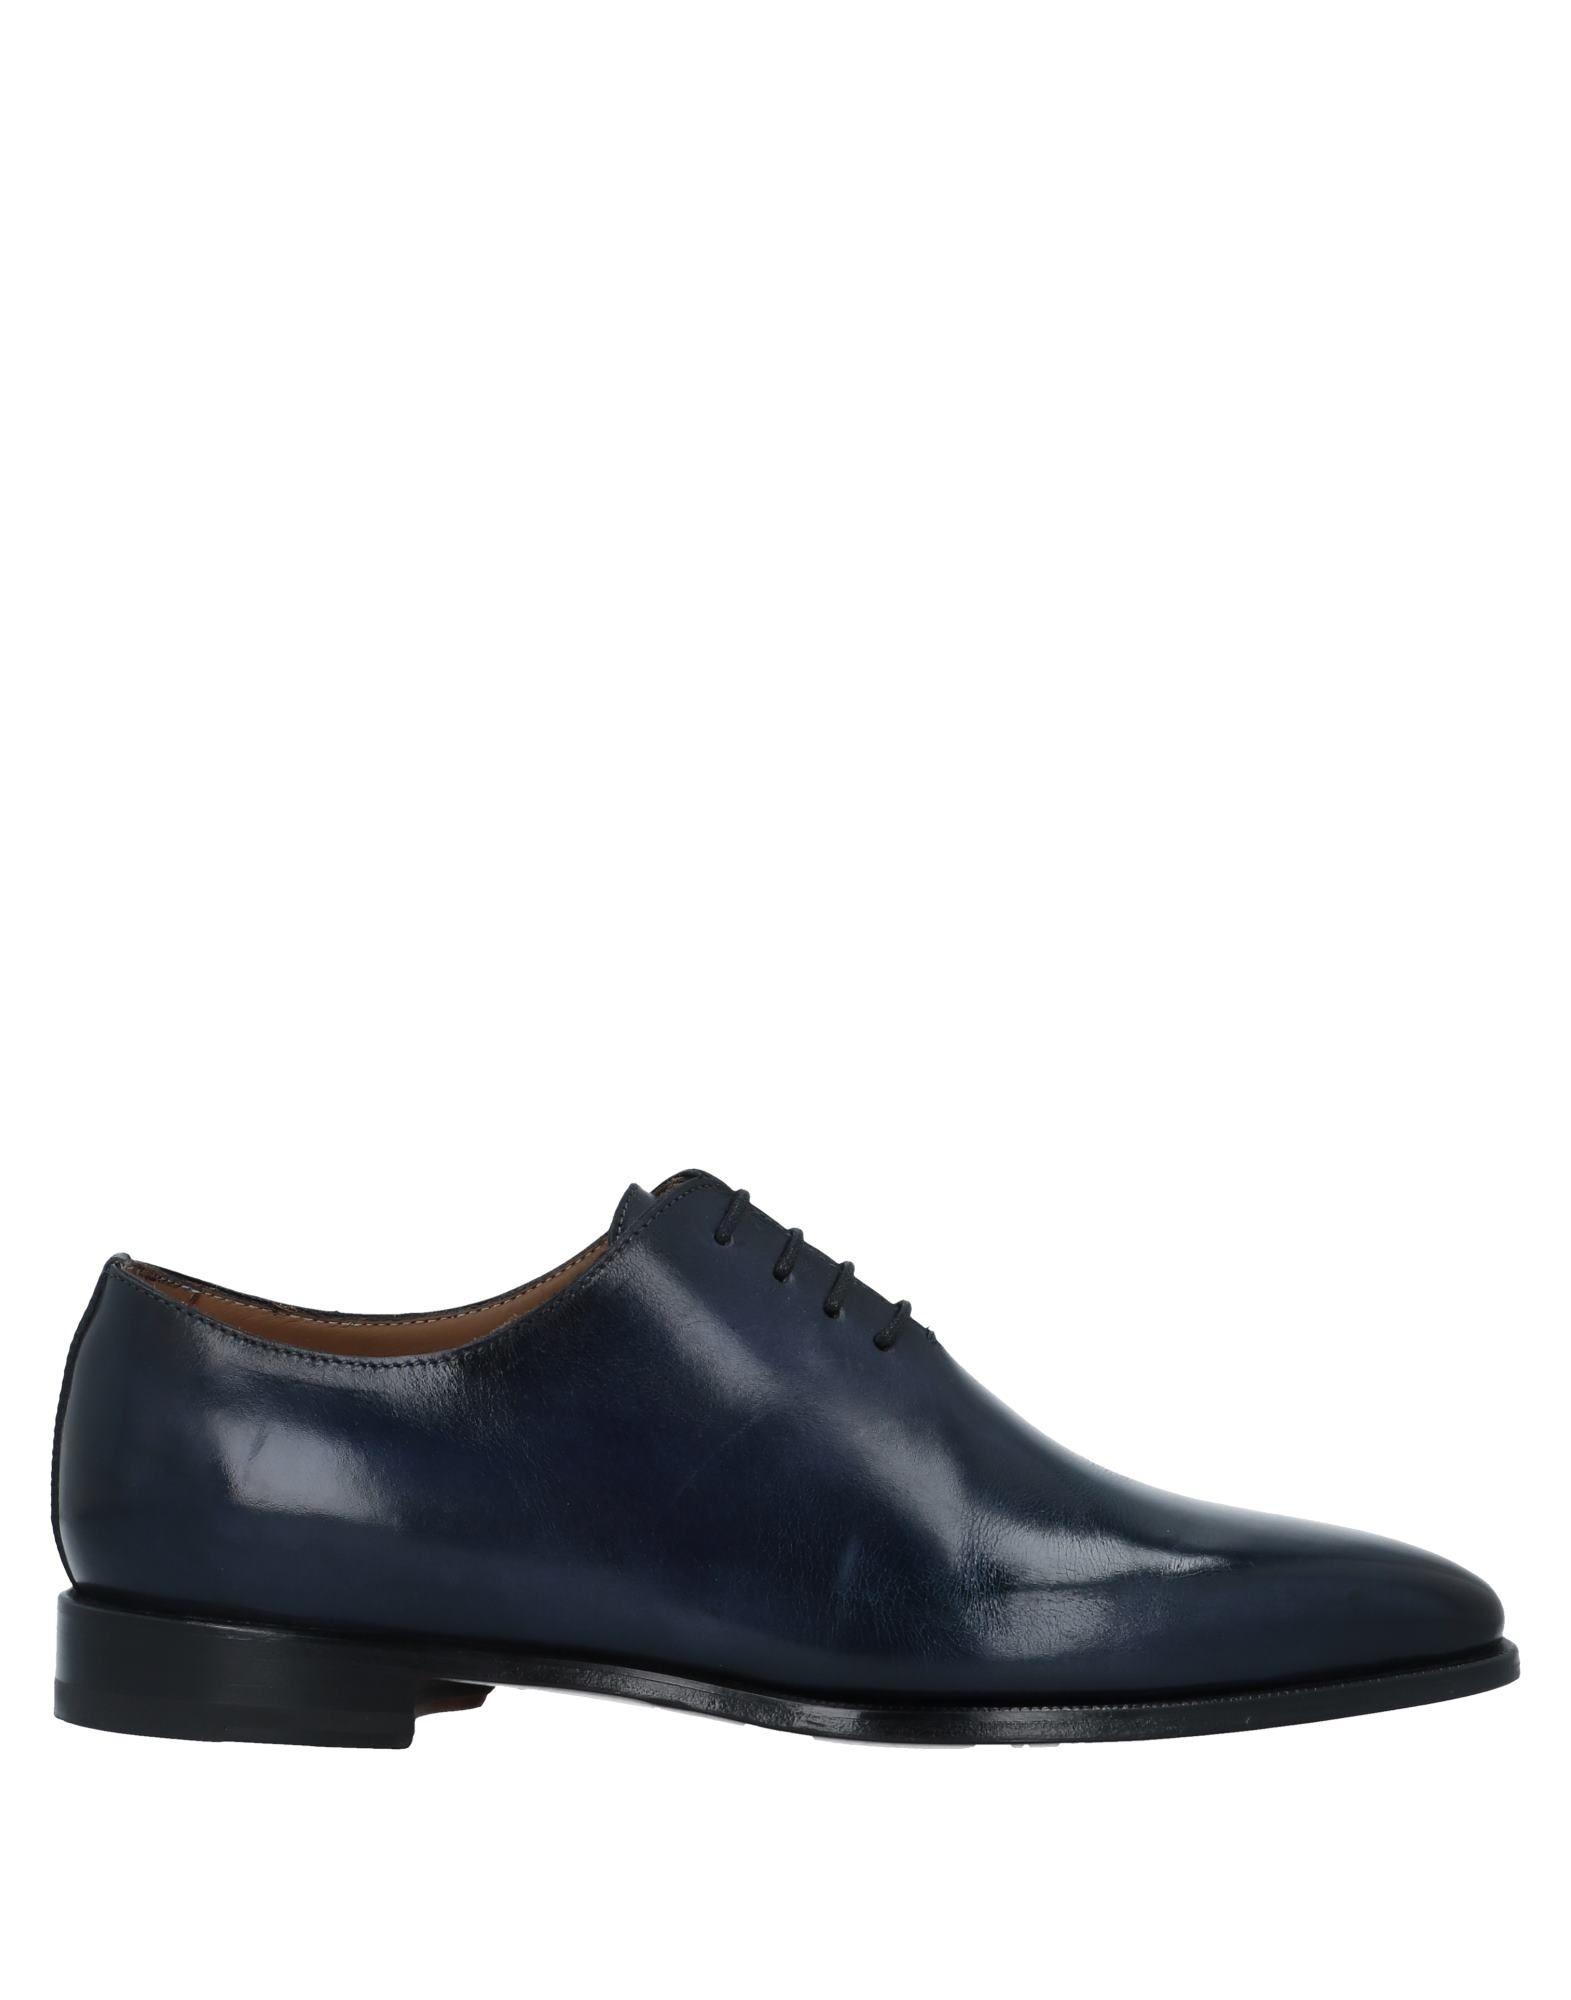 цена TROFEO by STEFANO BRANCHINI Обувь на шнурках онлайн в 2017 году